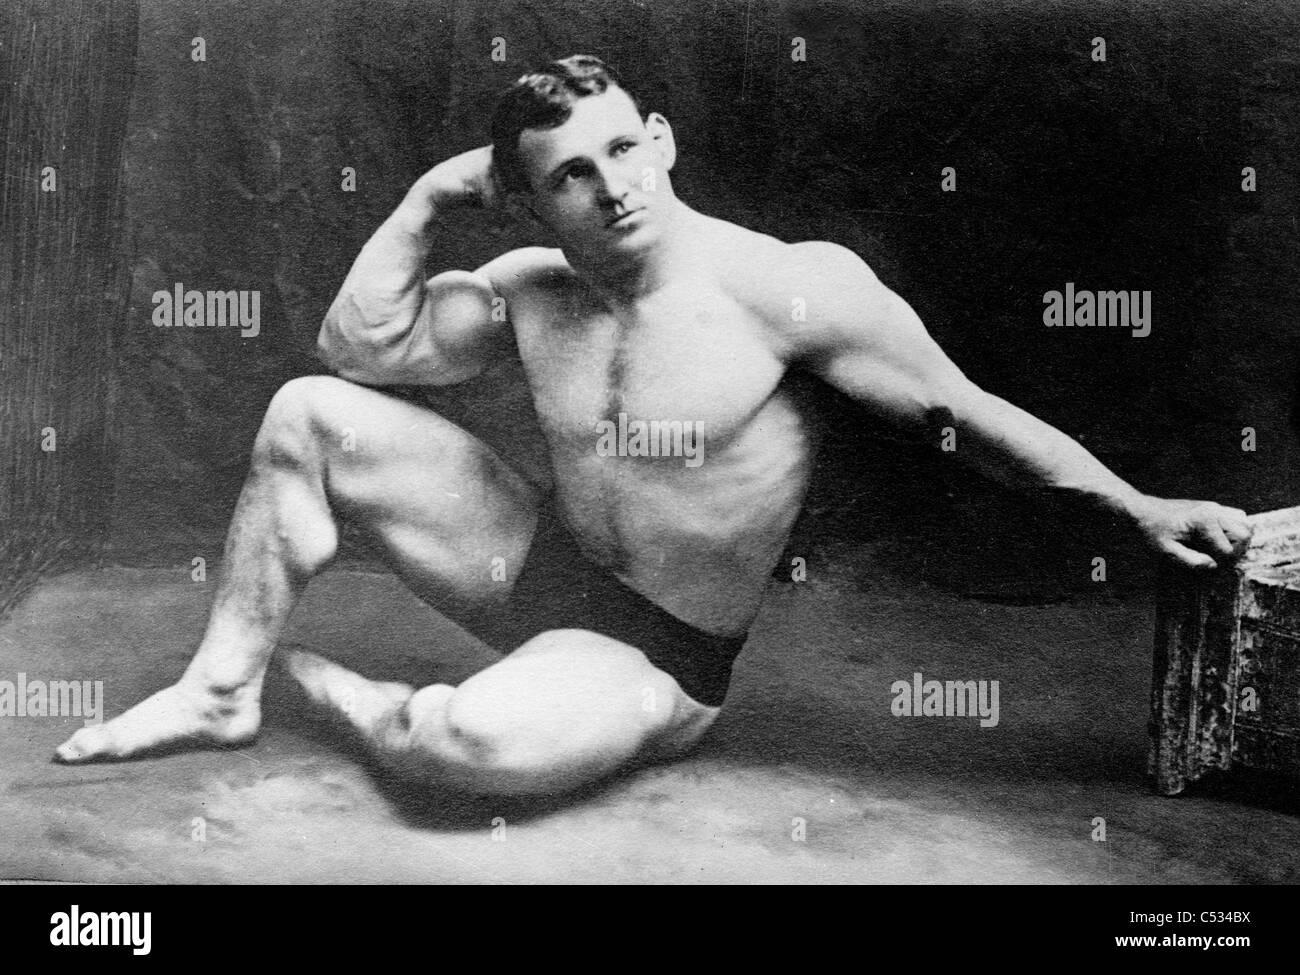 John Lemm, campione lottatore, circa 1910 - 1915 Immagini Stock